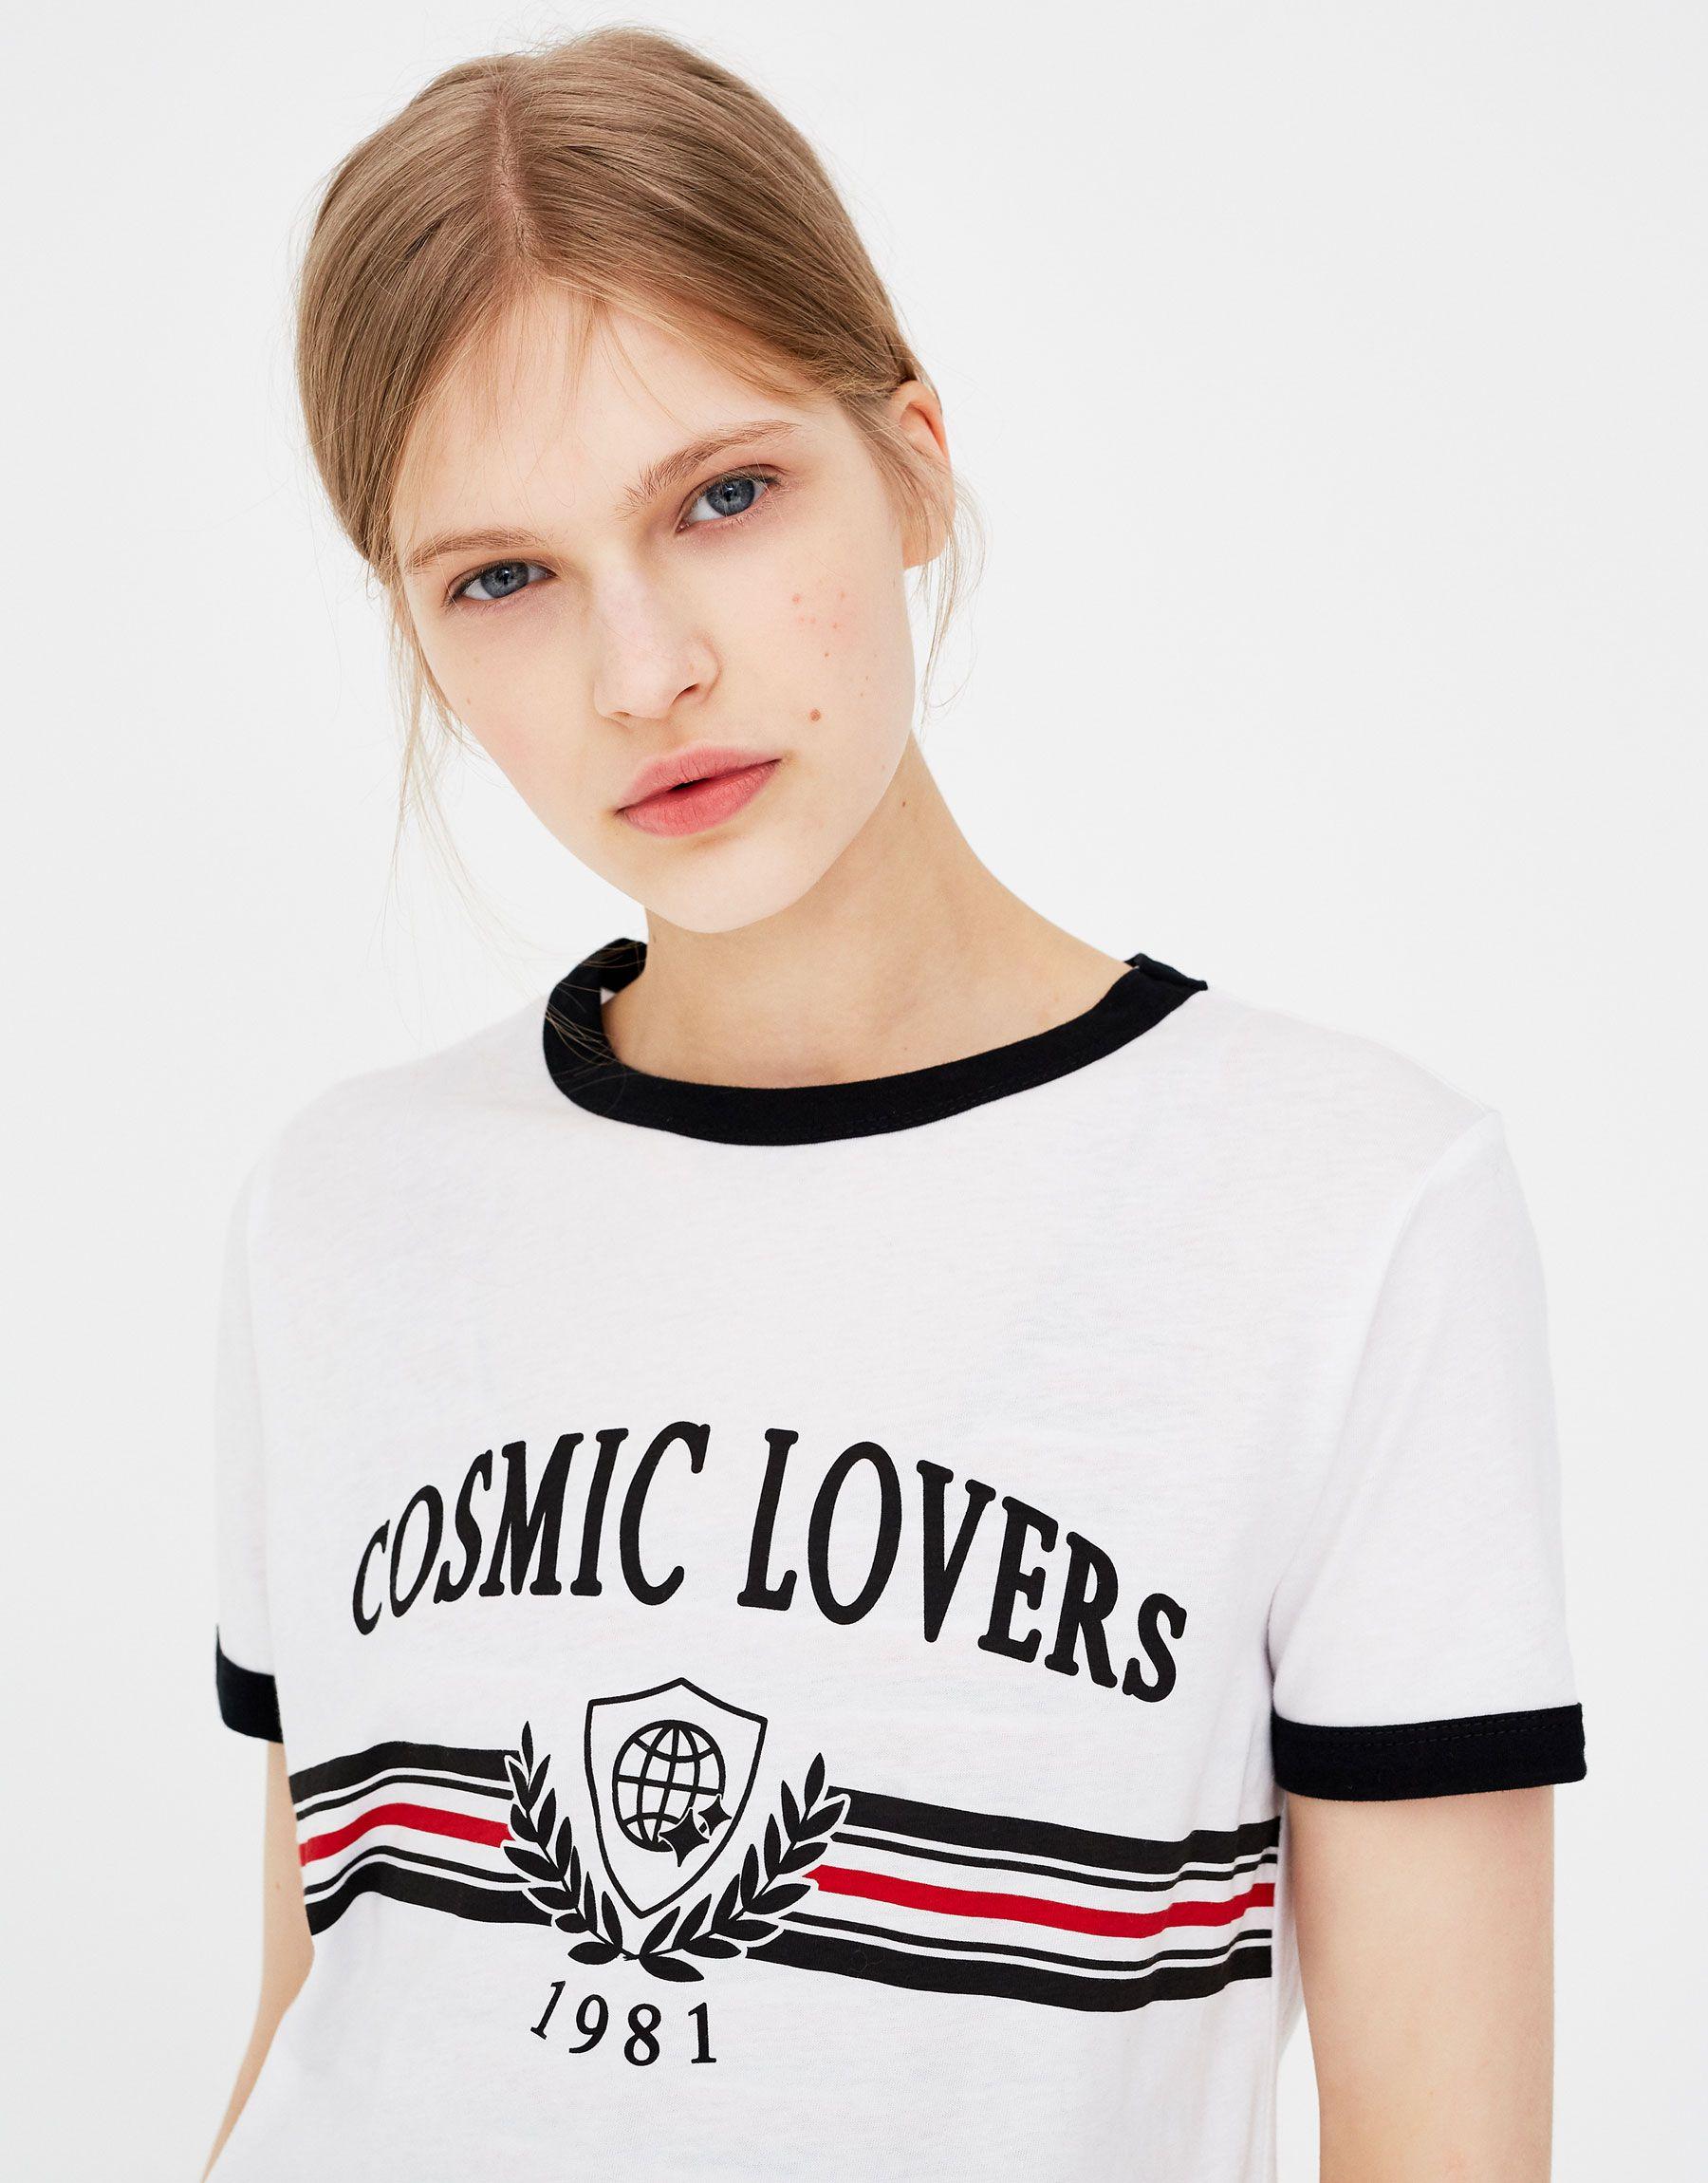 amp;bear Cosmic Lovers Mujer Pull Camiseta Texto Ropa Camisetas iXTOkZuP